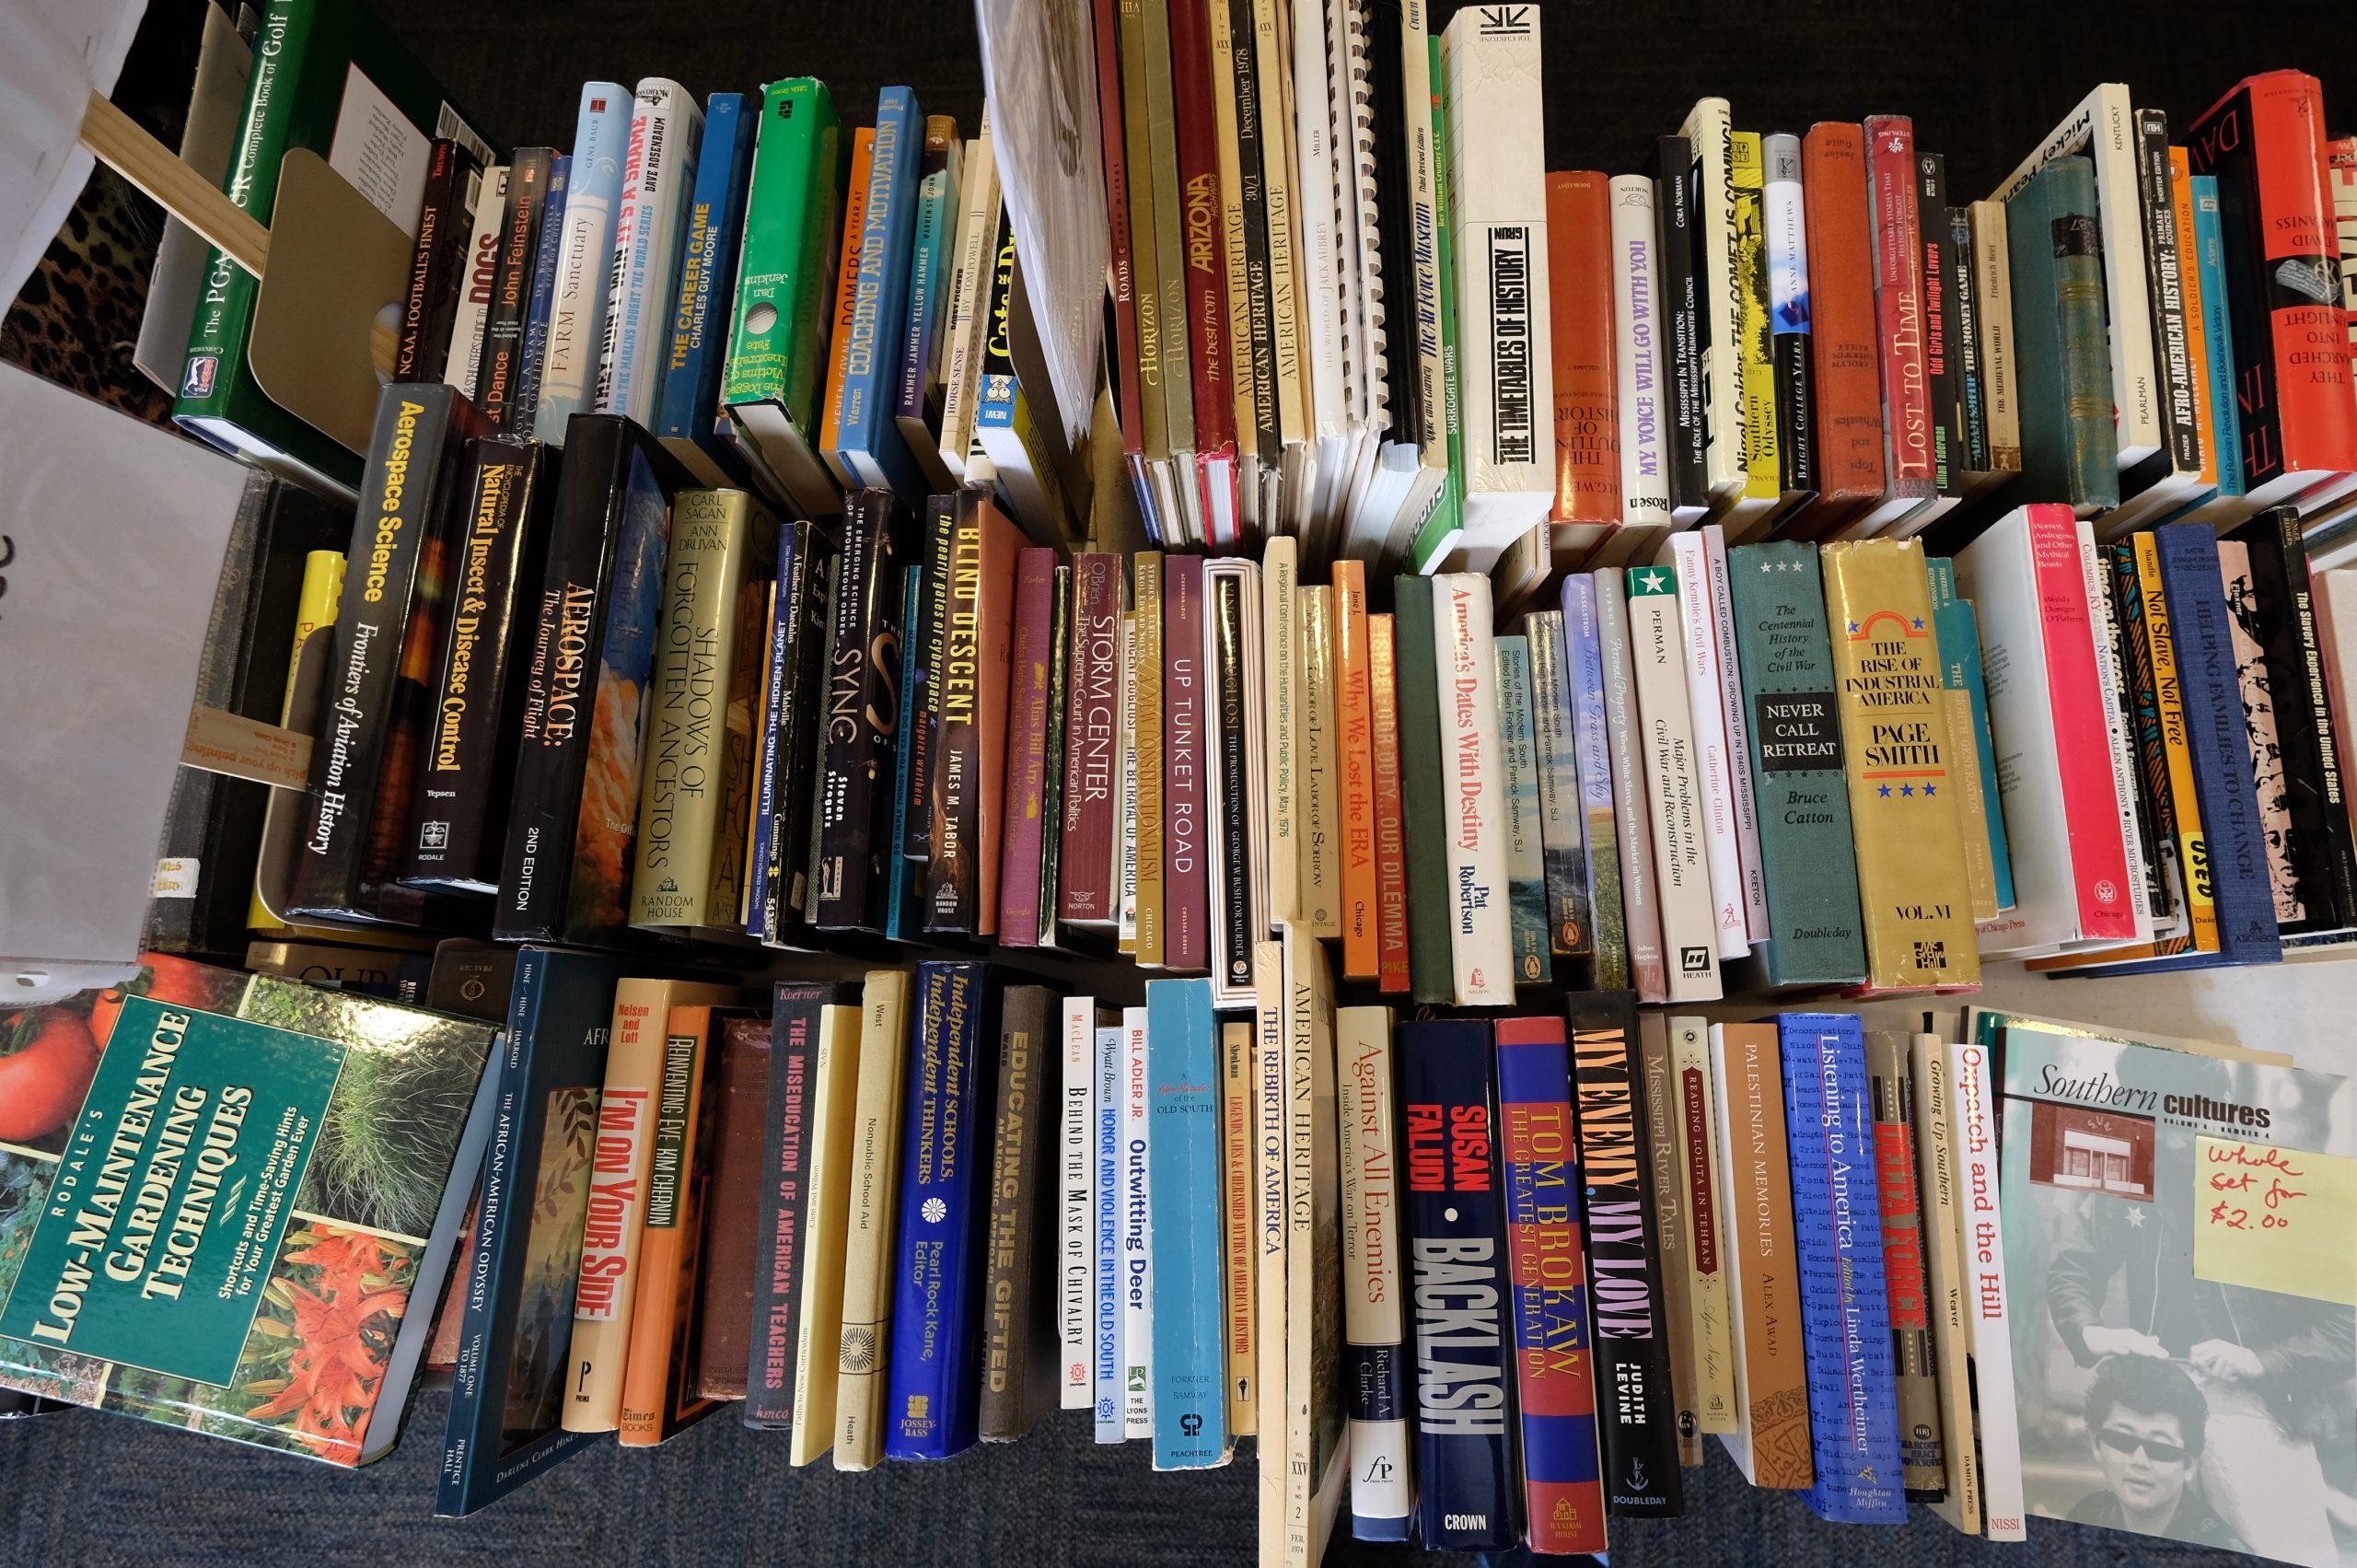 Overhead shot of books